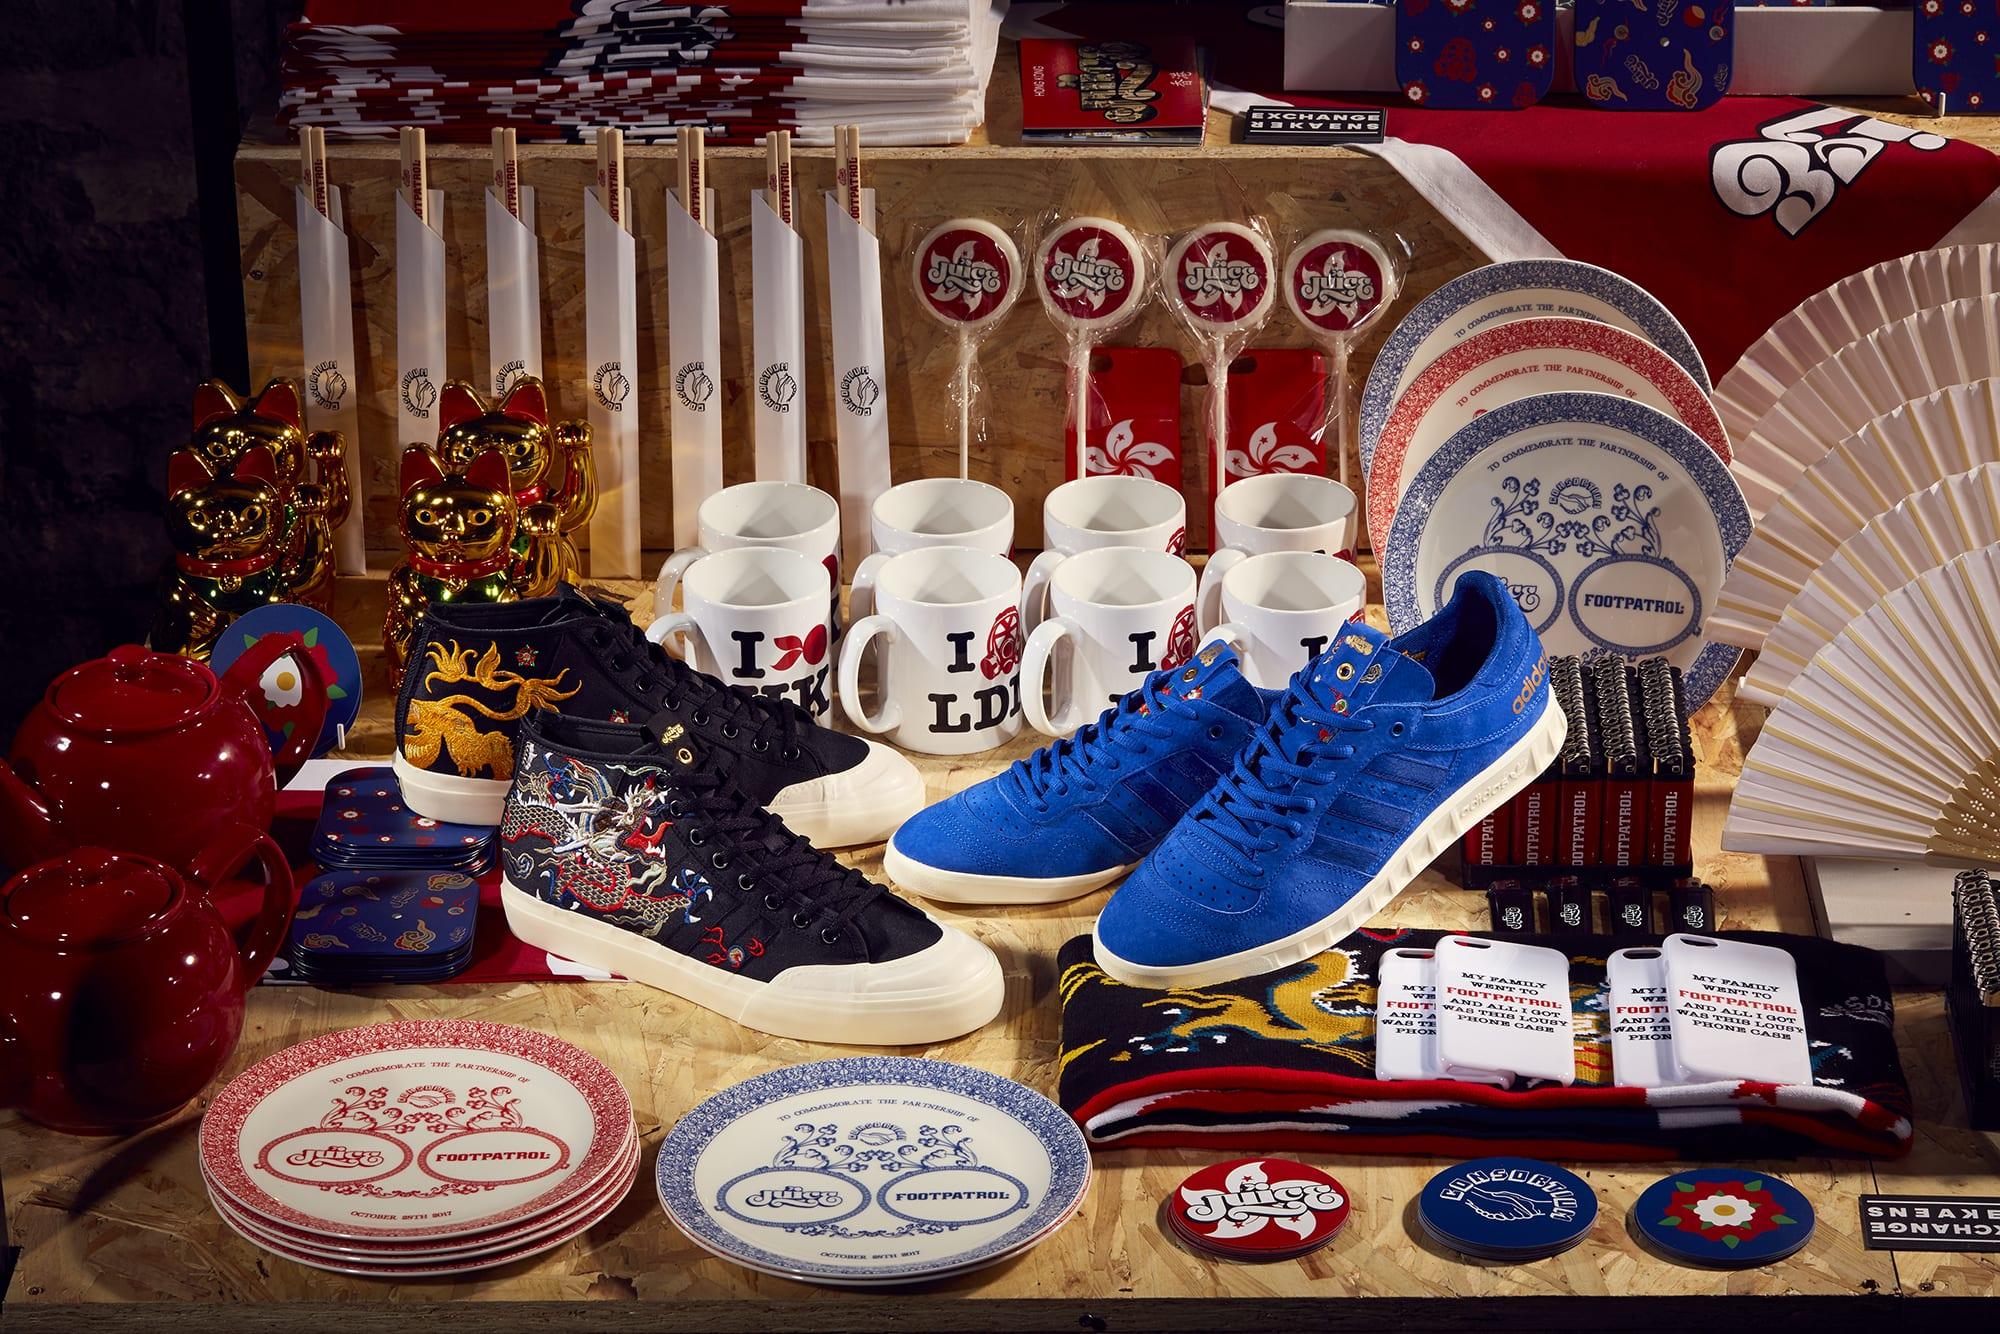 reputable site 7a9ee a7b4c Consortium Juice x FP Concept Shot 2 adidas Consortium Sneaker Exchange –  Juice   Footpatrol